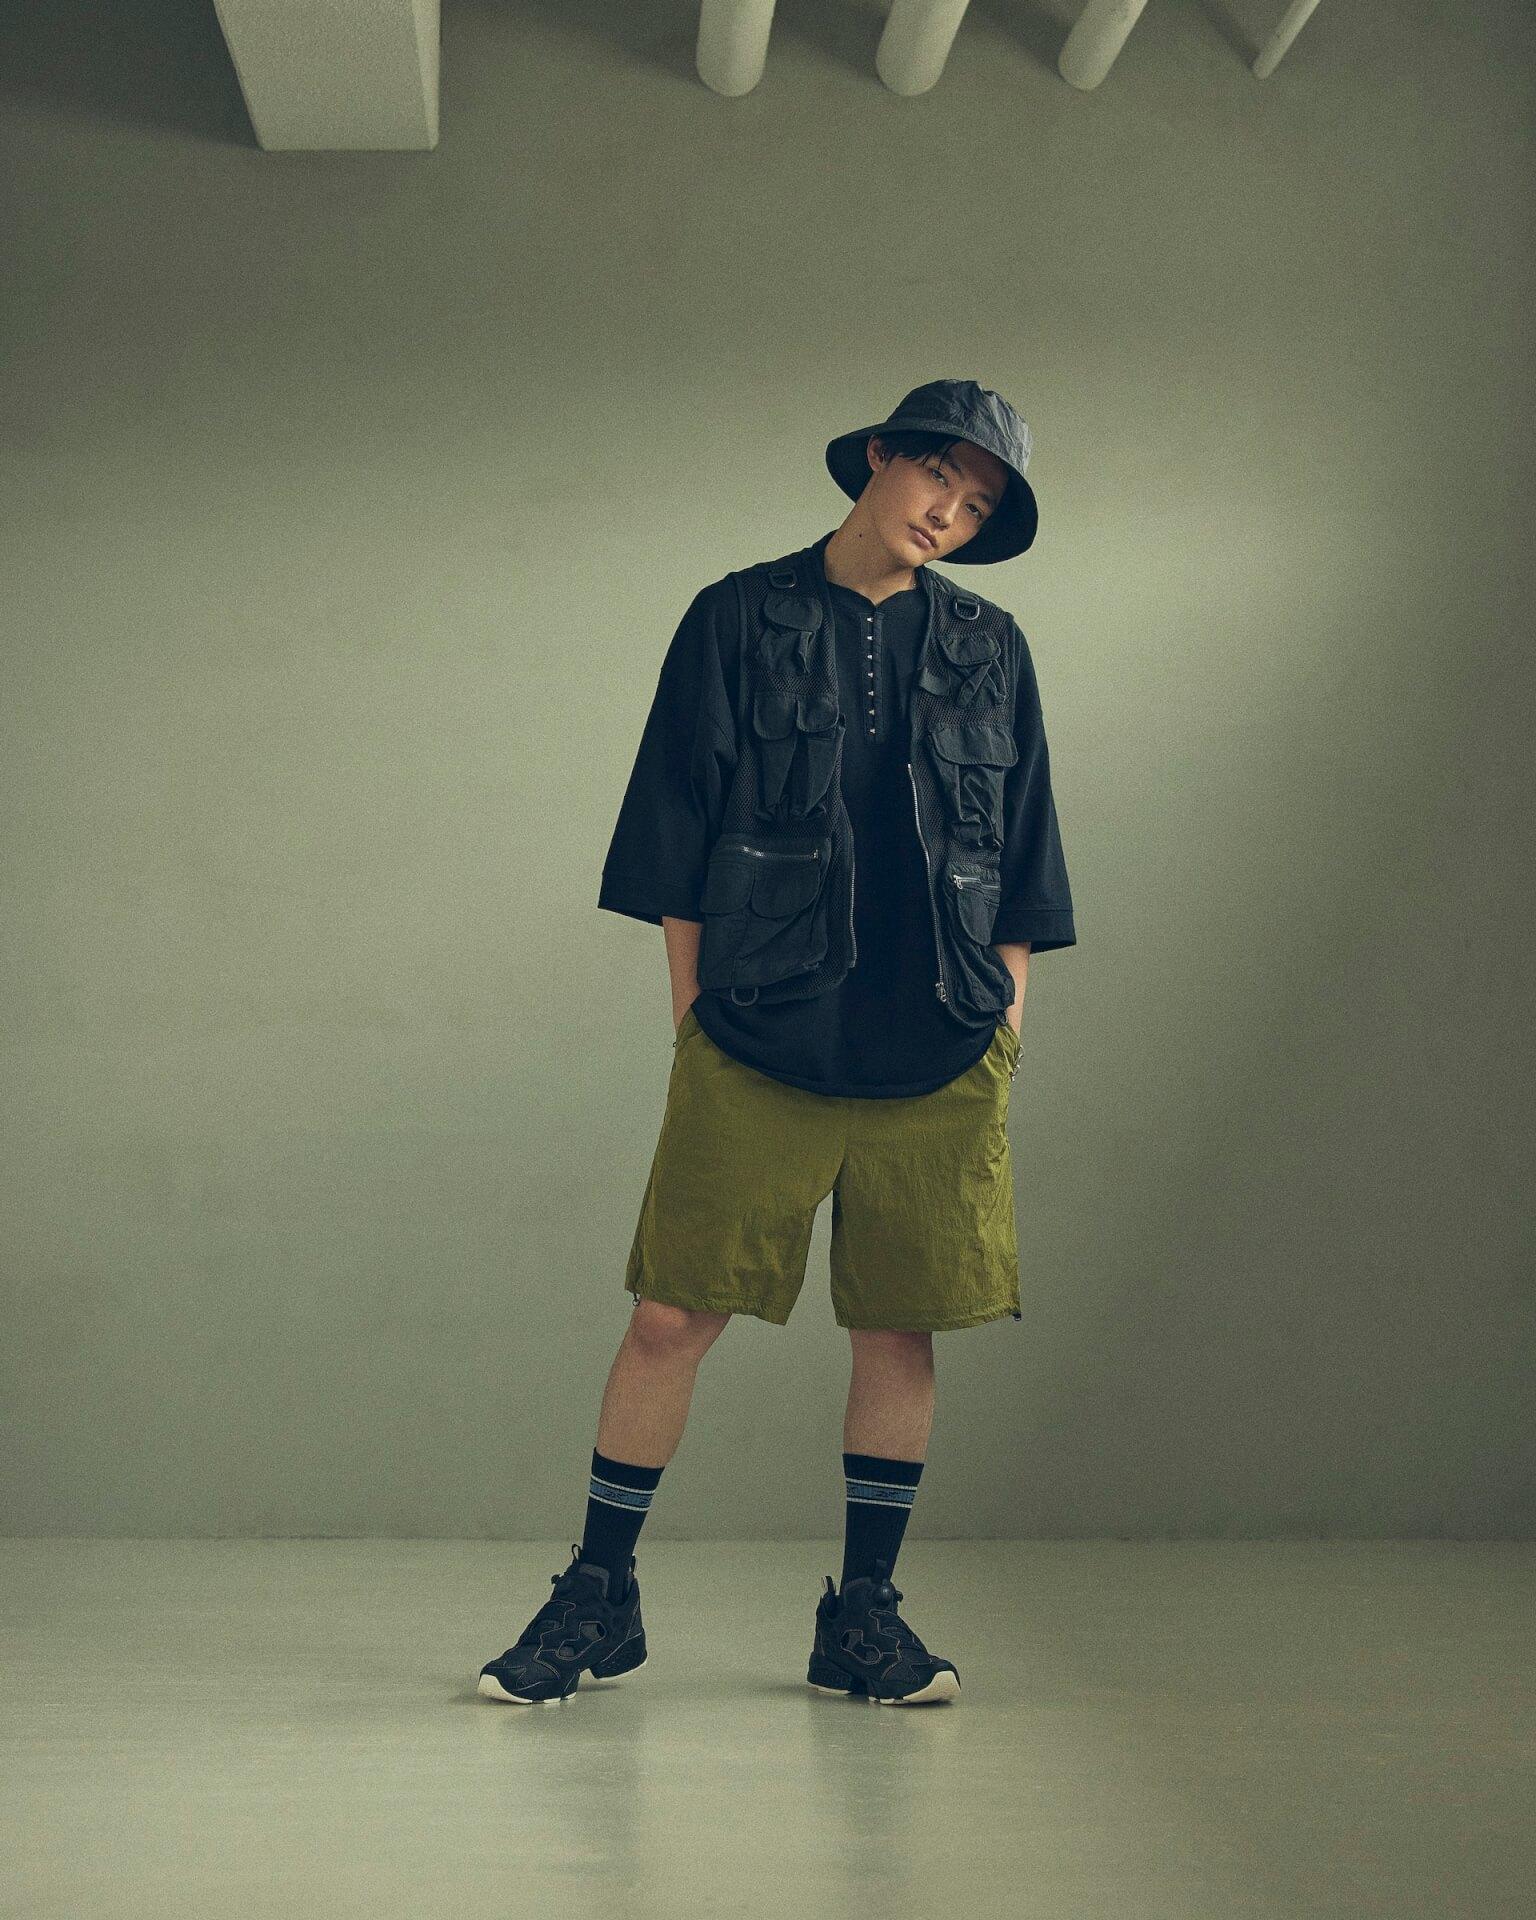 ReebokからリアルなデニムをイメージしたINSTAPUMP FURYの「DENIM PACK」が発売!櫻井海音とアンジュルム佐々木莉佳子がルックに登場 Fashion_210719_denimpack1